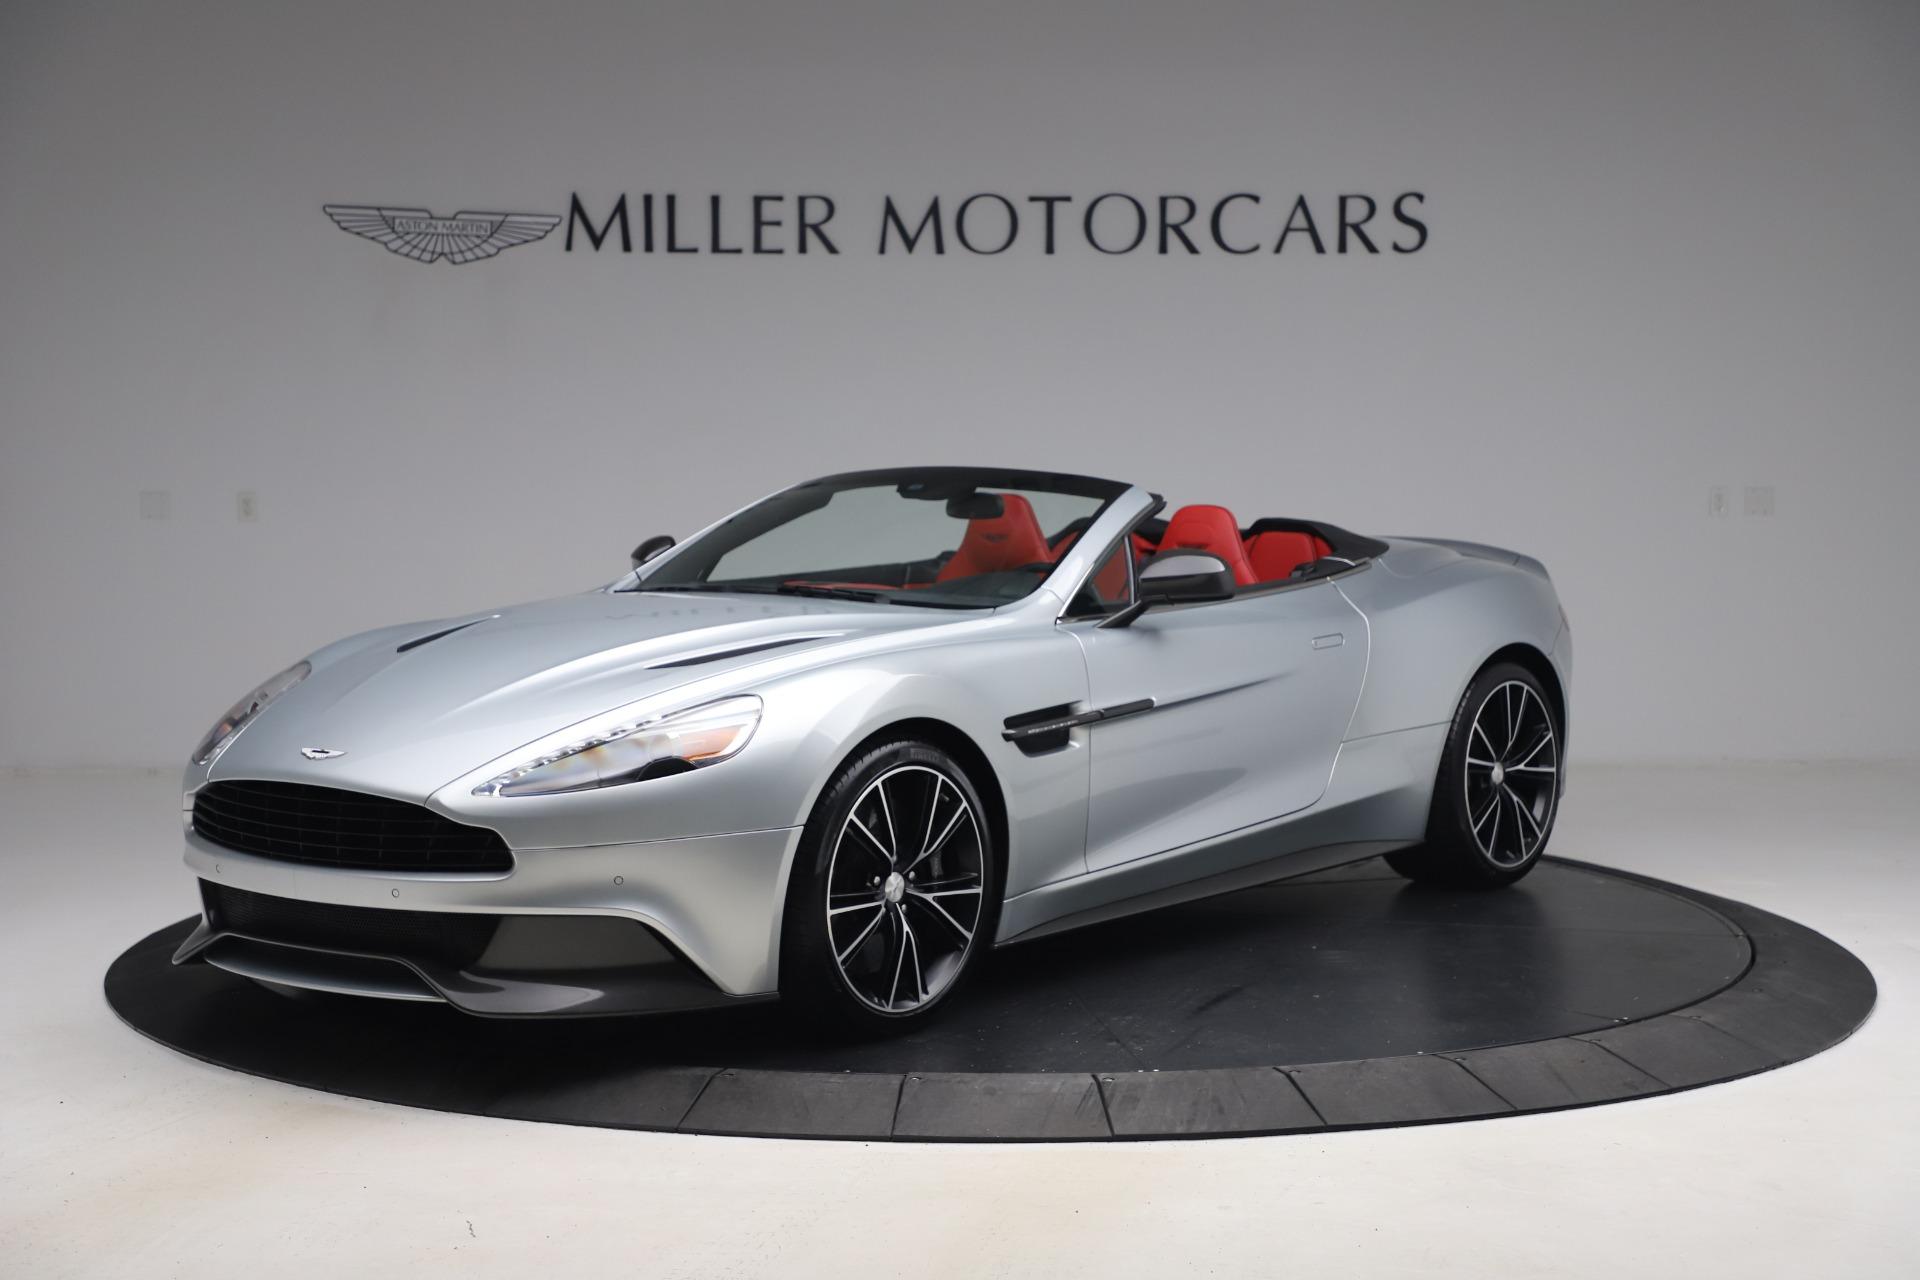 Used 2014 Aston Martin Vanquish Volante for sale $129,900 at Maserati of Greenwich in Greenwich CT 06830 1